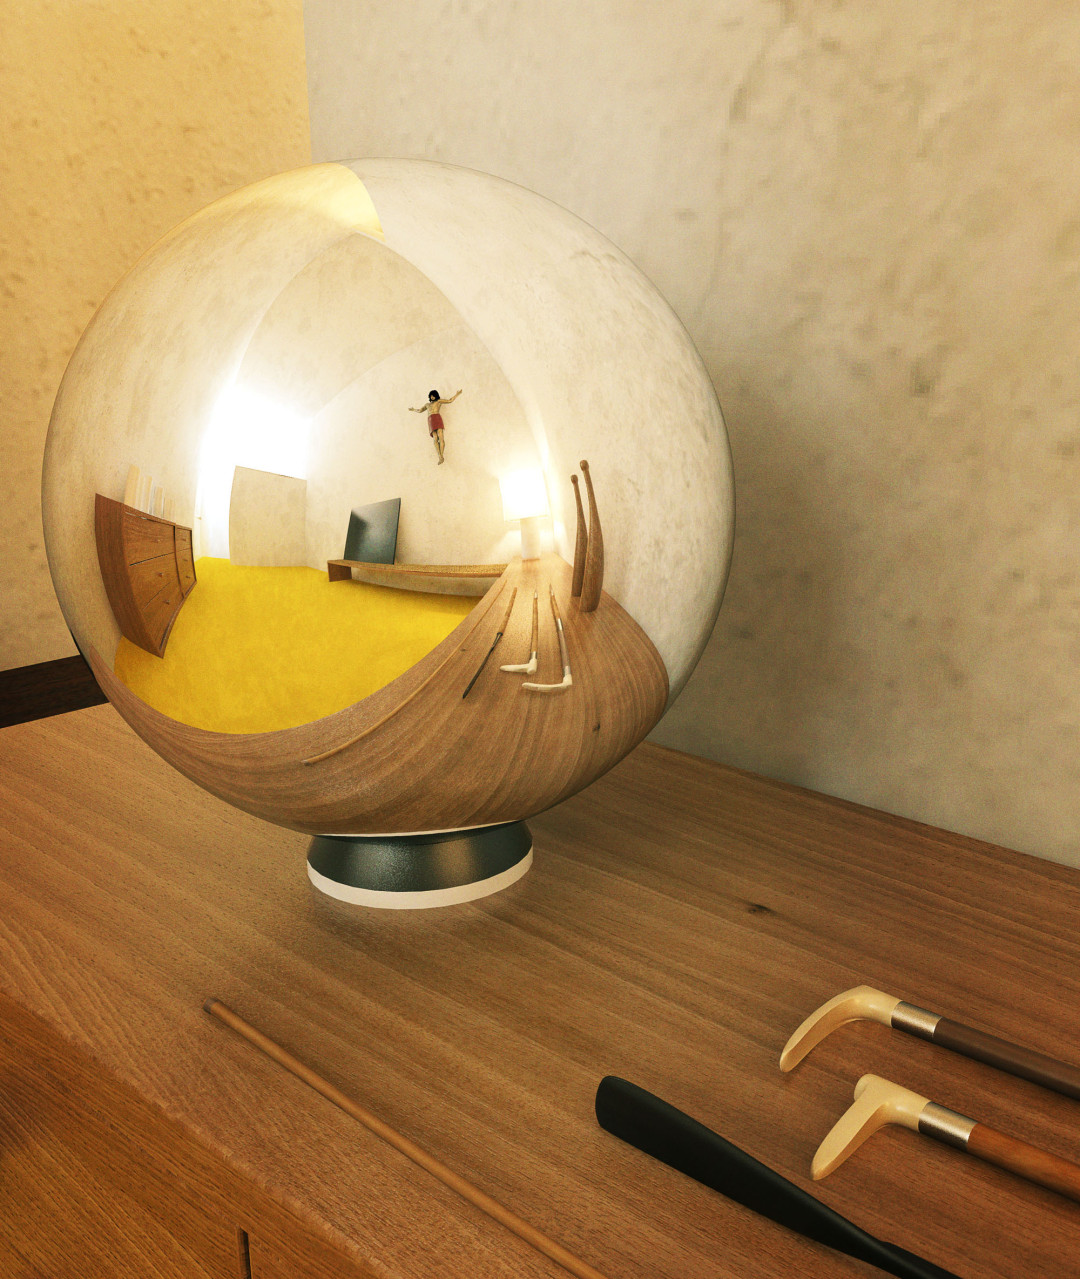 Casa_Barragan_silverball_CGI_by_xoio